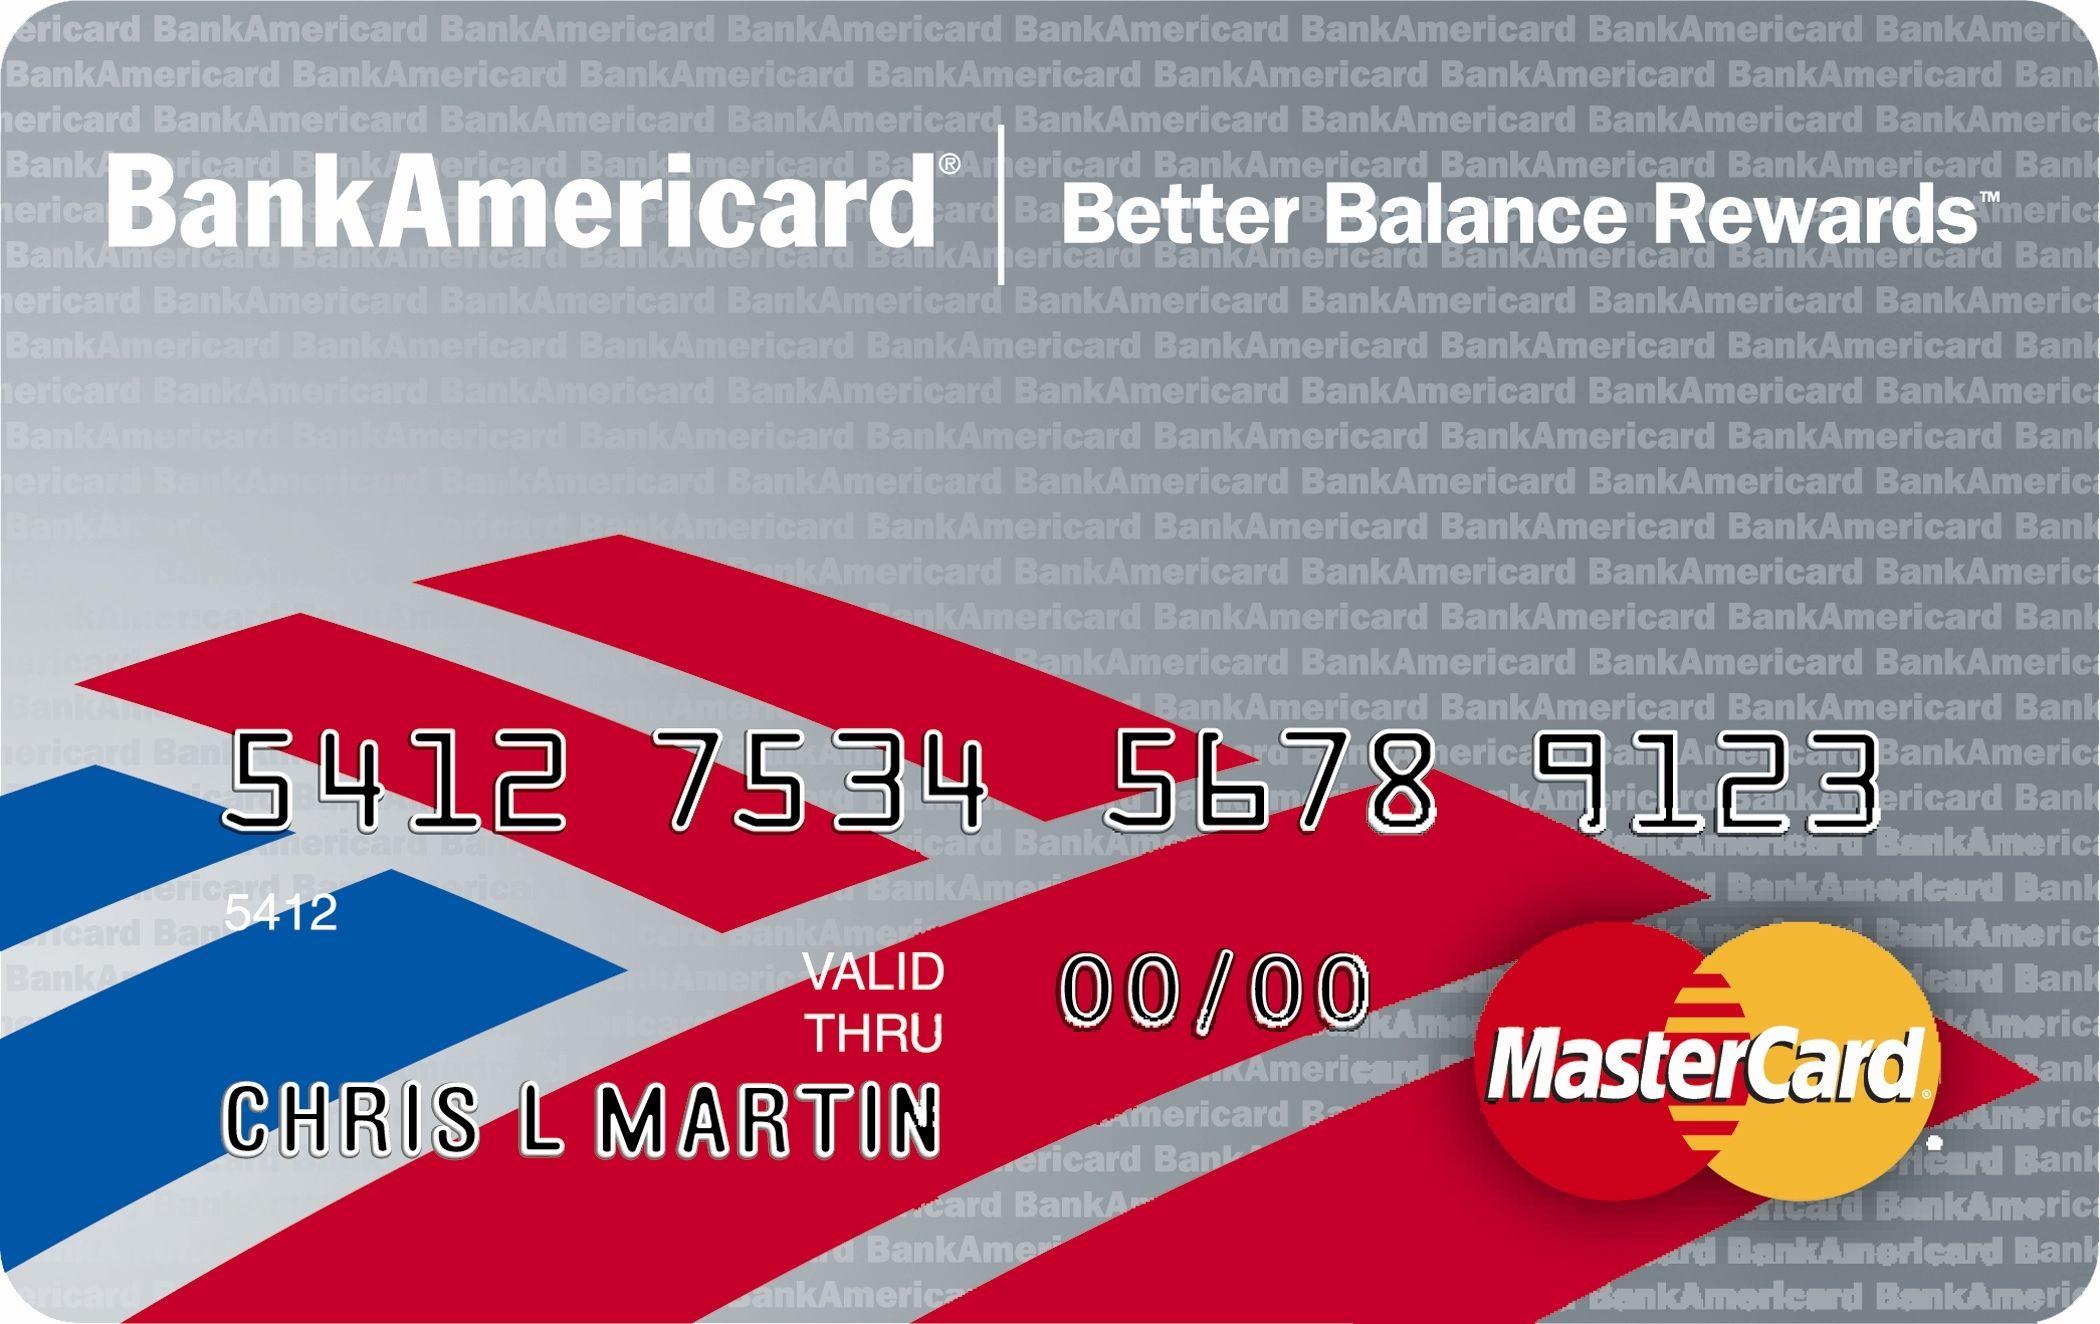 Bank Of America Business Kreditkarte Bietet, Ebenso Wie